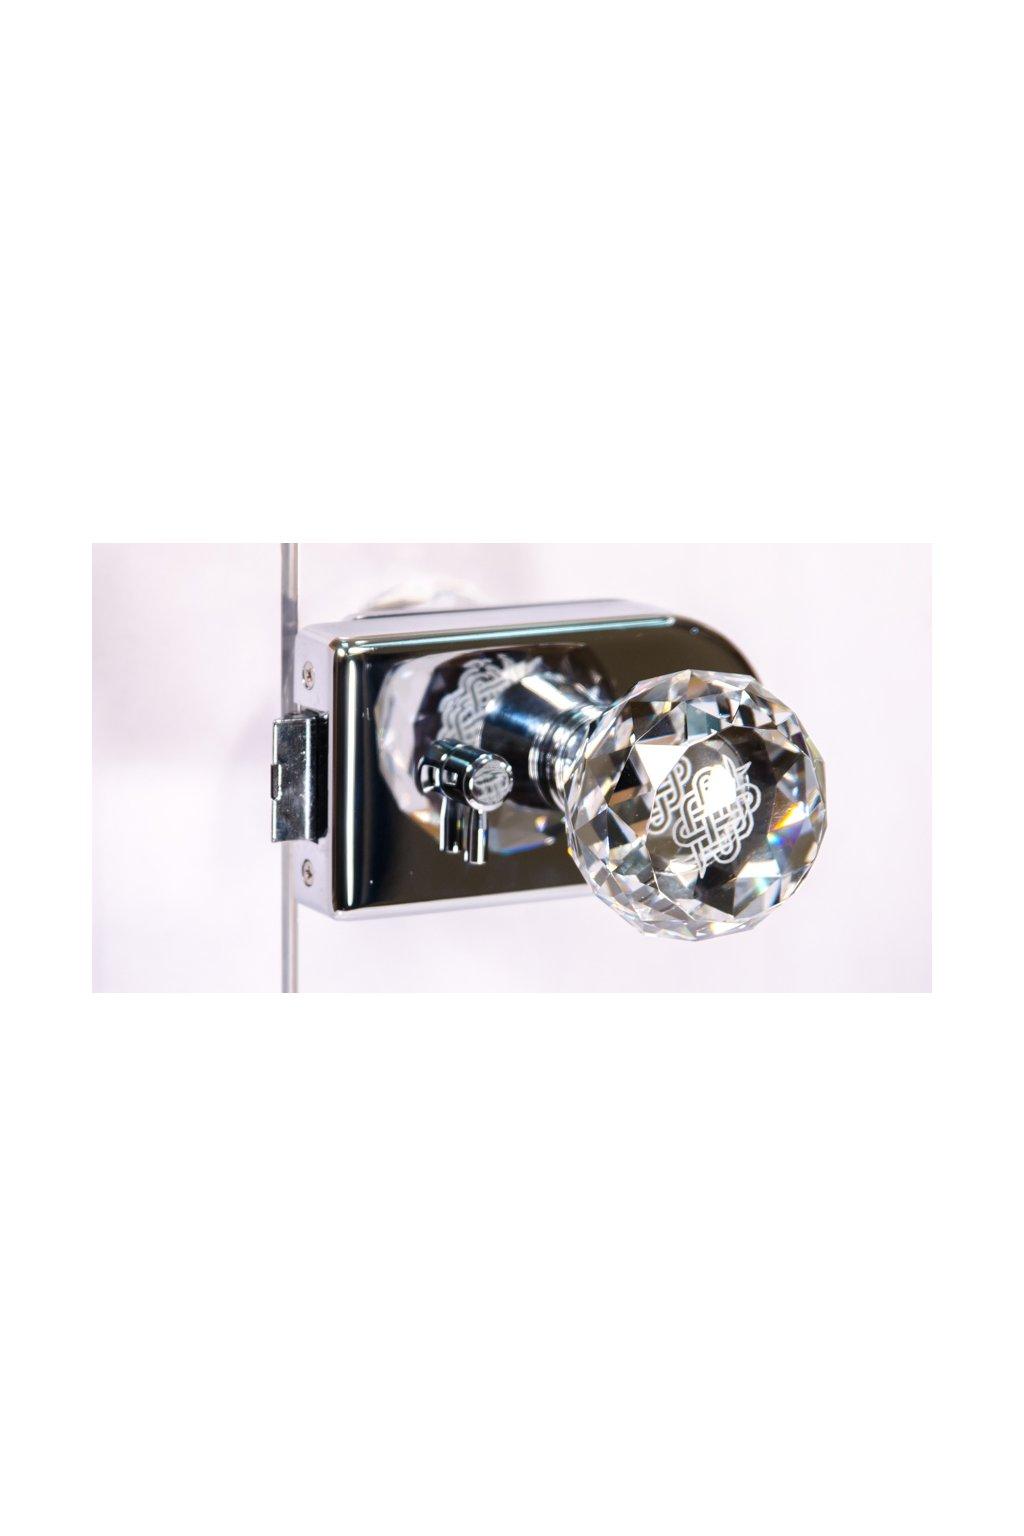 Onyx Krystal  B6020/0 Glass